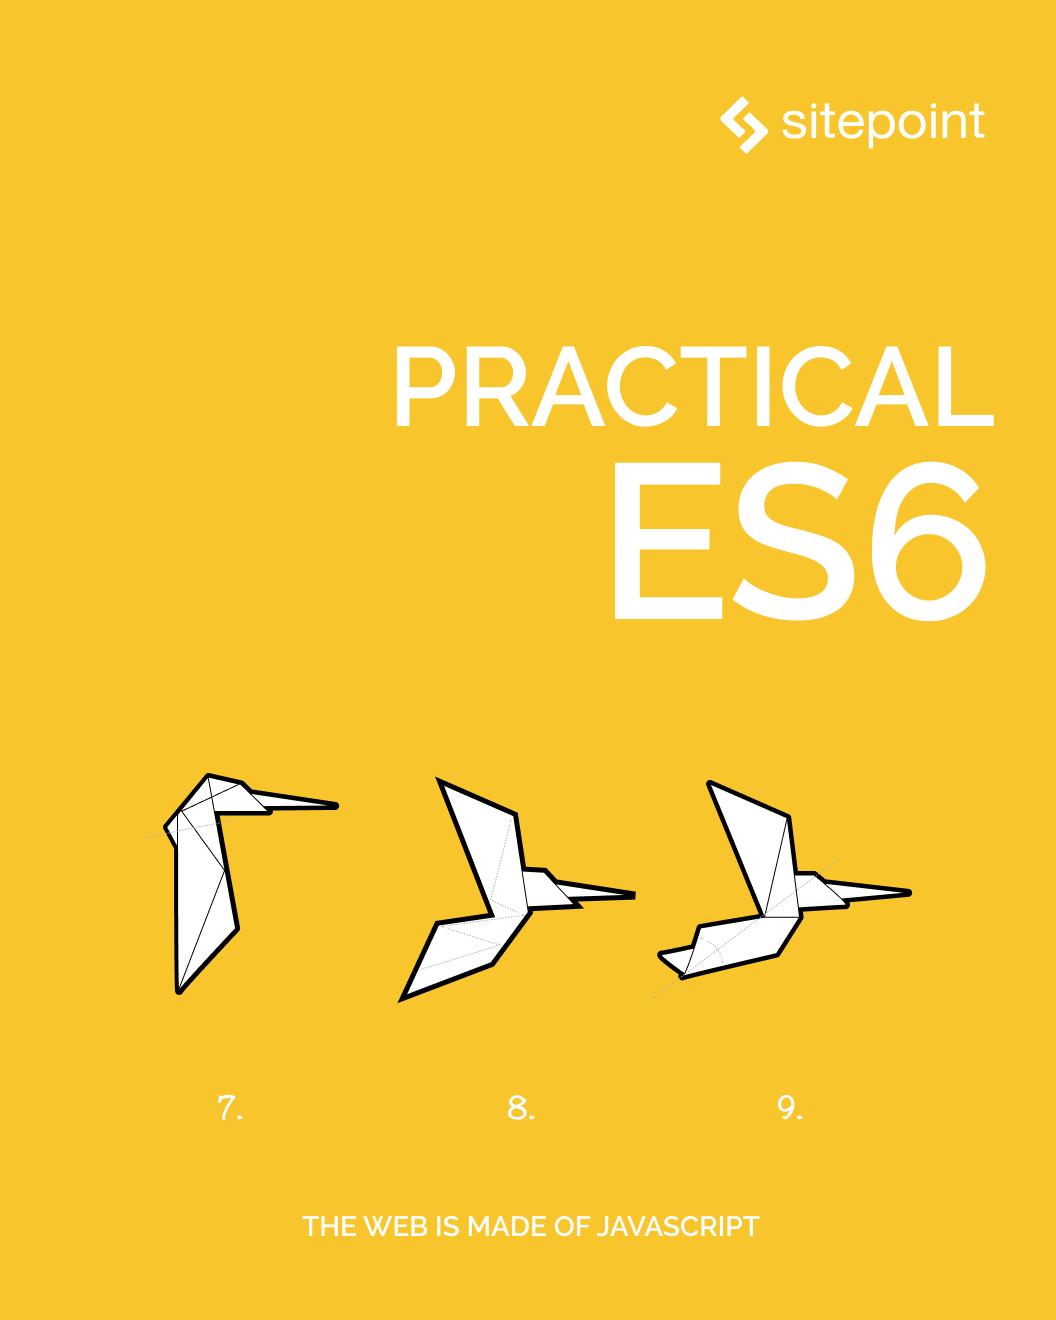 Pratical ES6 - Sitepoint